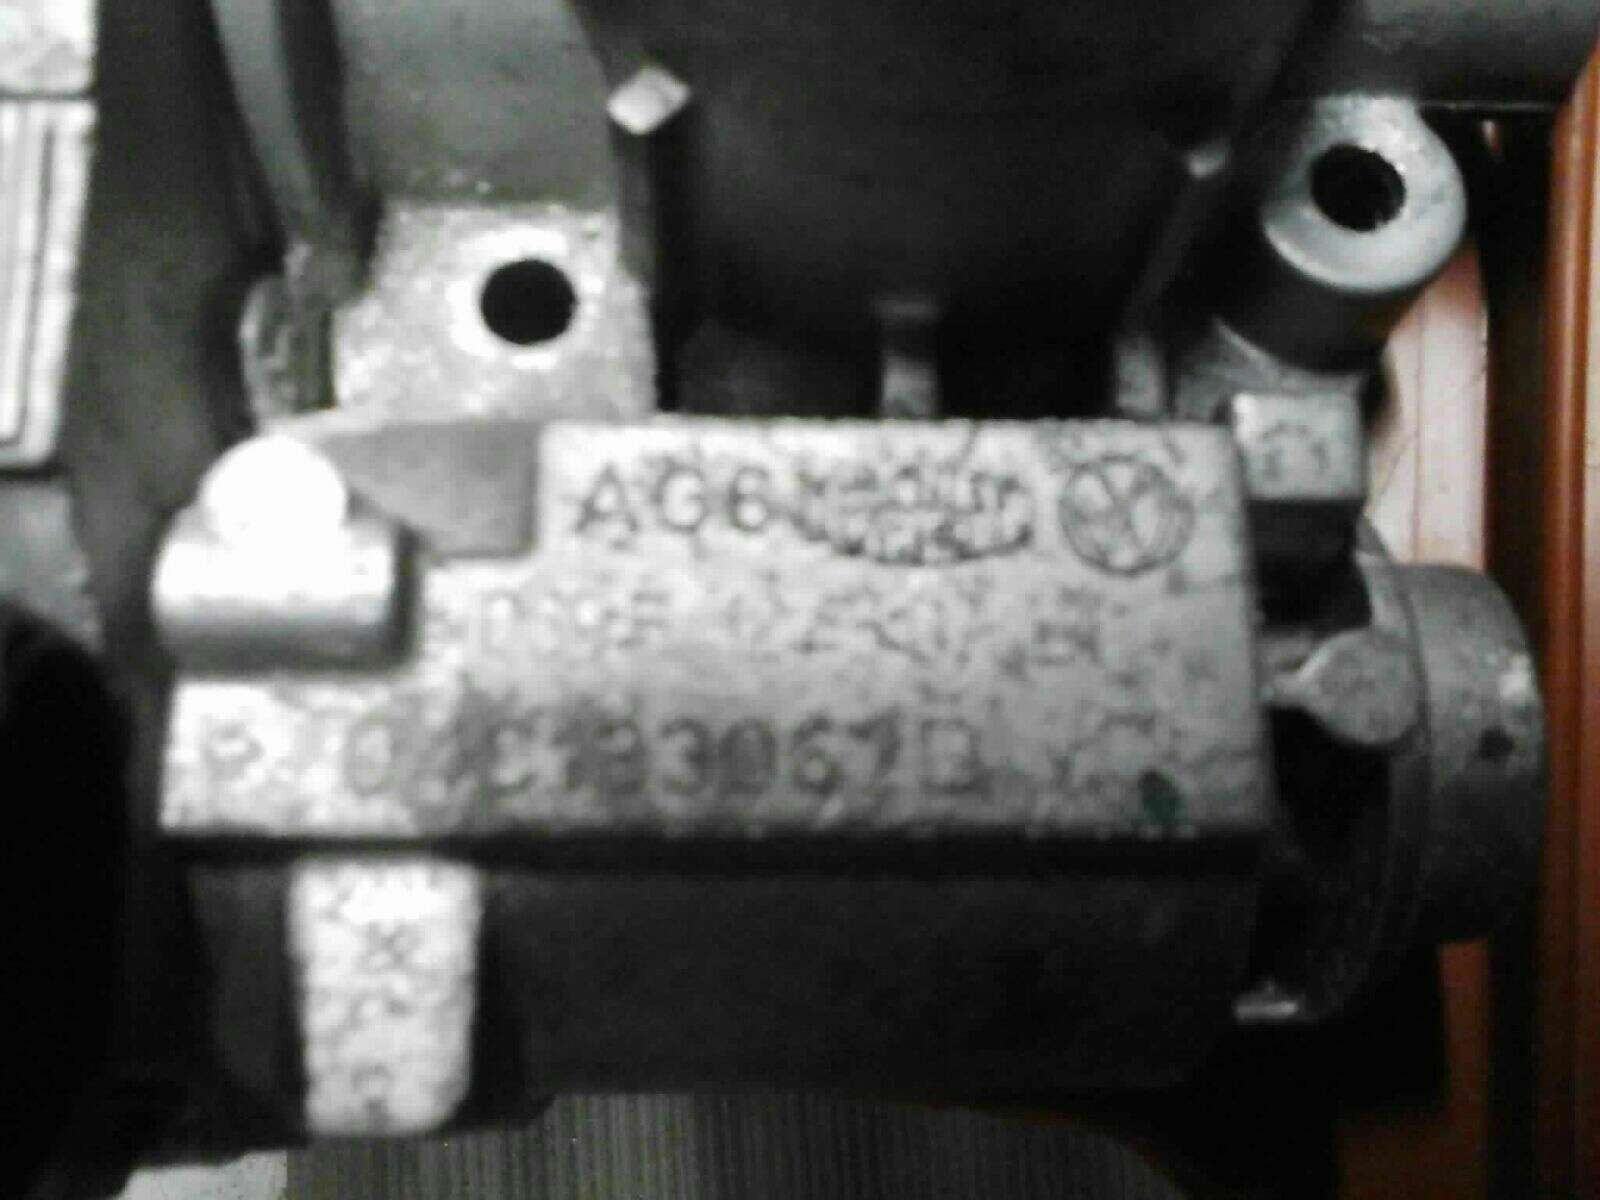 2015 Skoda Citigo 2012 On 10 Petrol Chya Throttle Body 04c133062d Fuse Box 1638 Parts Matching